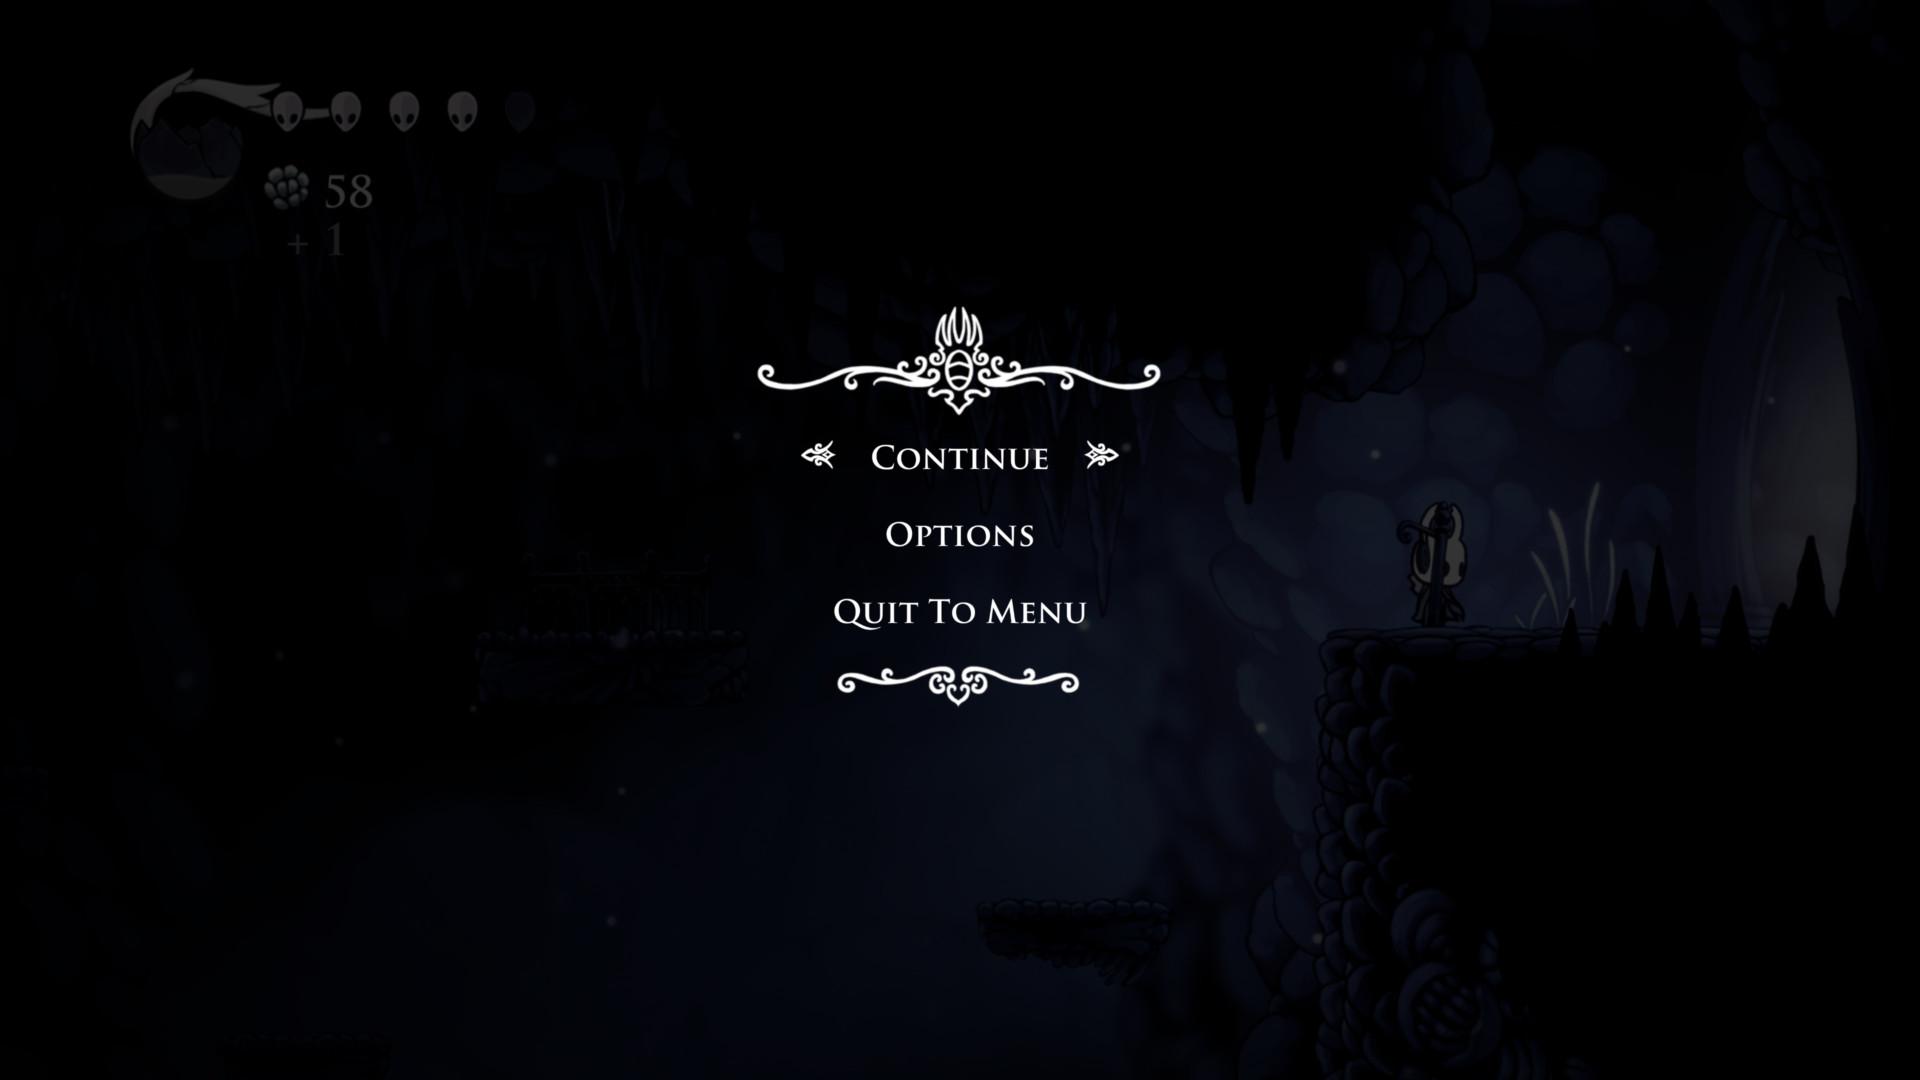 Game menu screenshot of Hollow Knight video game interface.